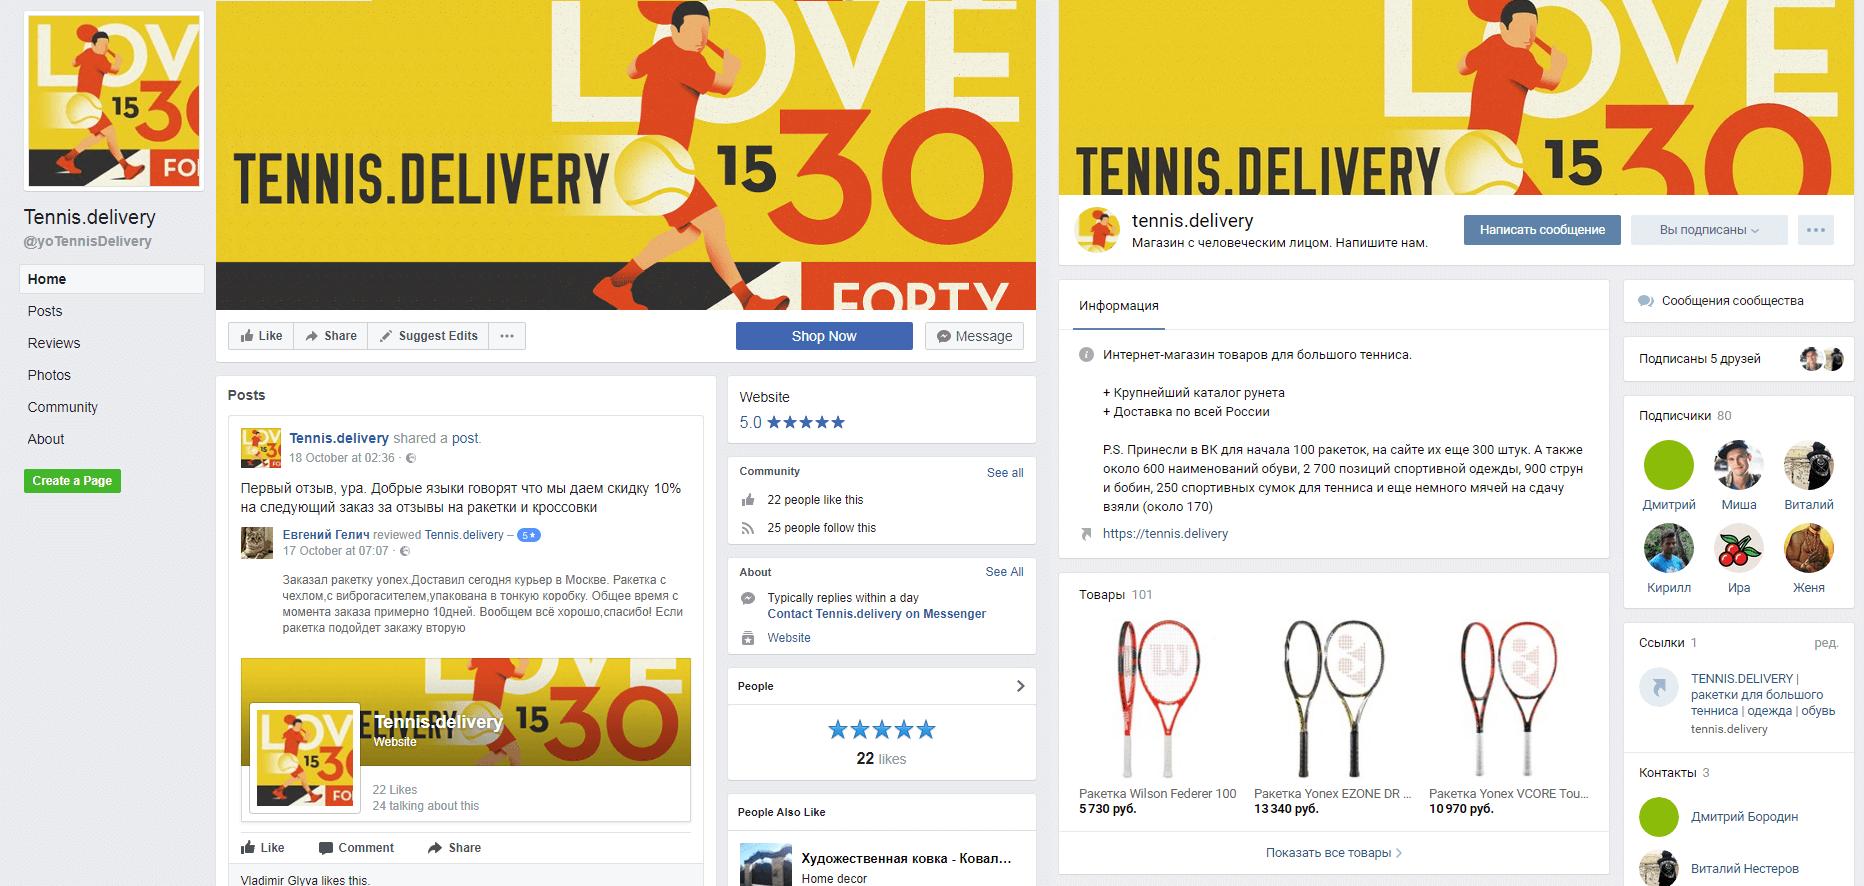 tennis.delivery facebook page